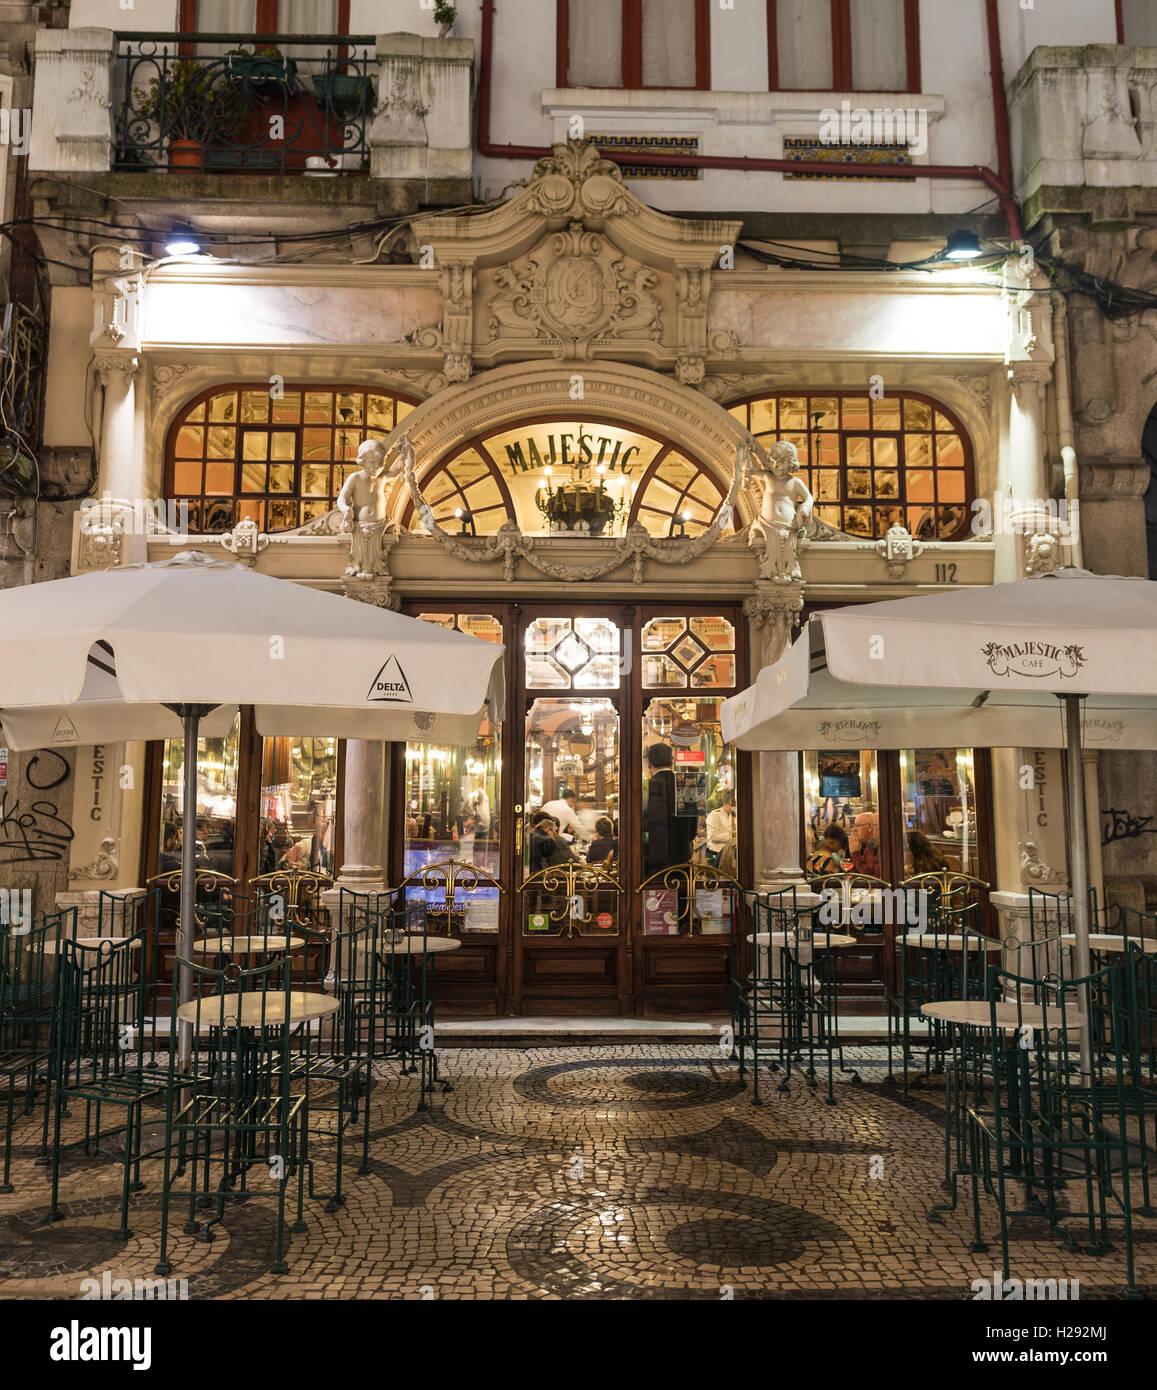 Majestic Café at night, Late Belle Époque, Porto, Portugal - Stock Image